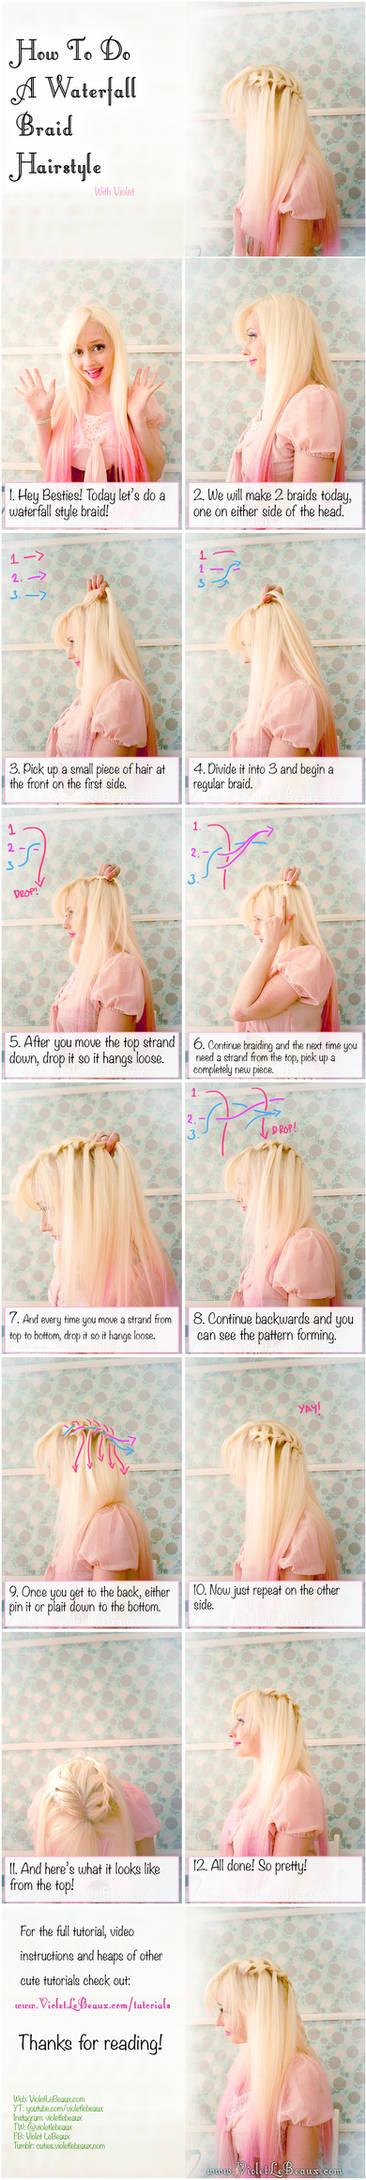 Waterfall Braid Hairstyle Tutorial